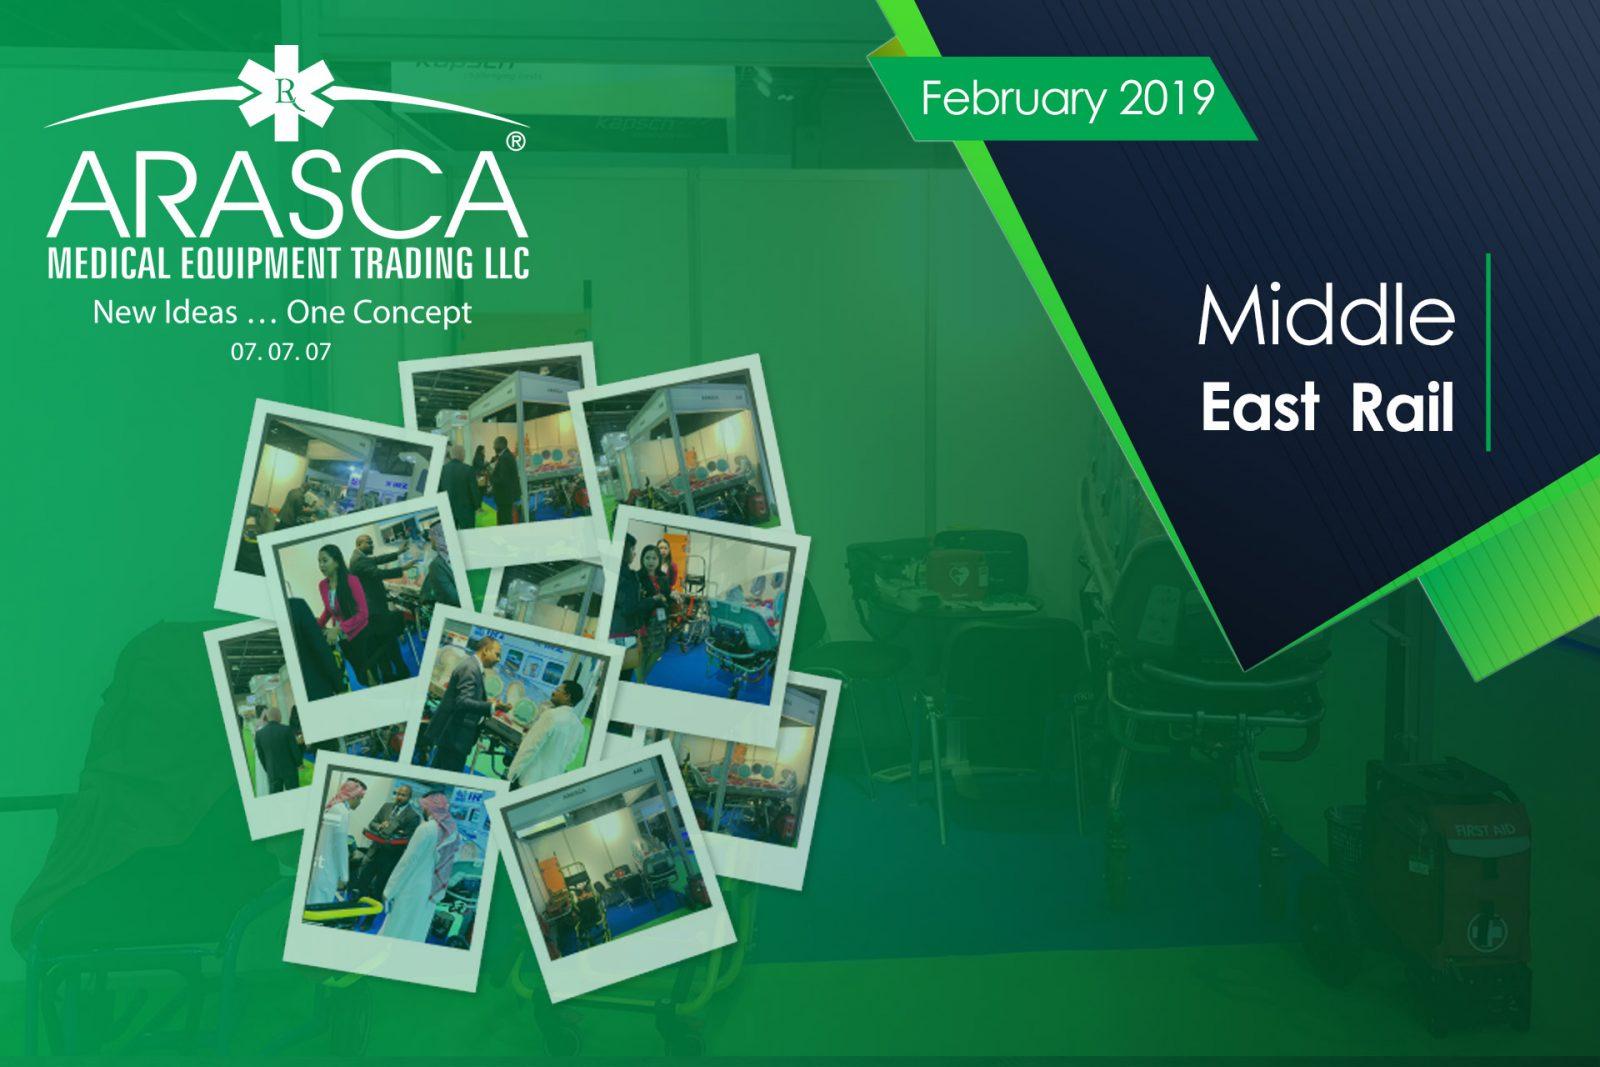 Gallery – ARASCA Medical Equipment Trading LLC